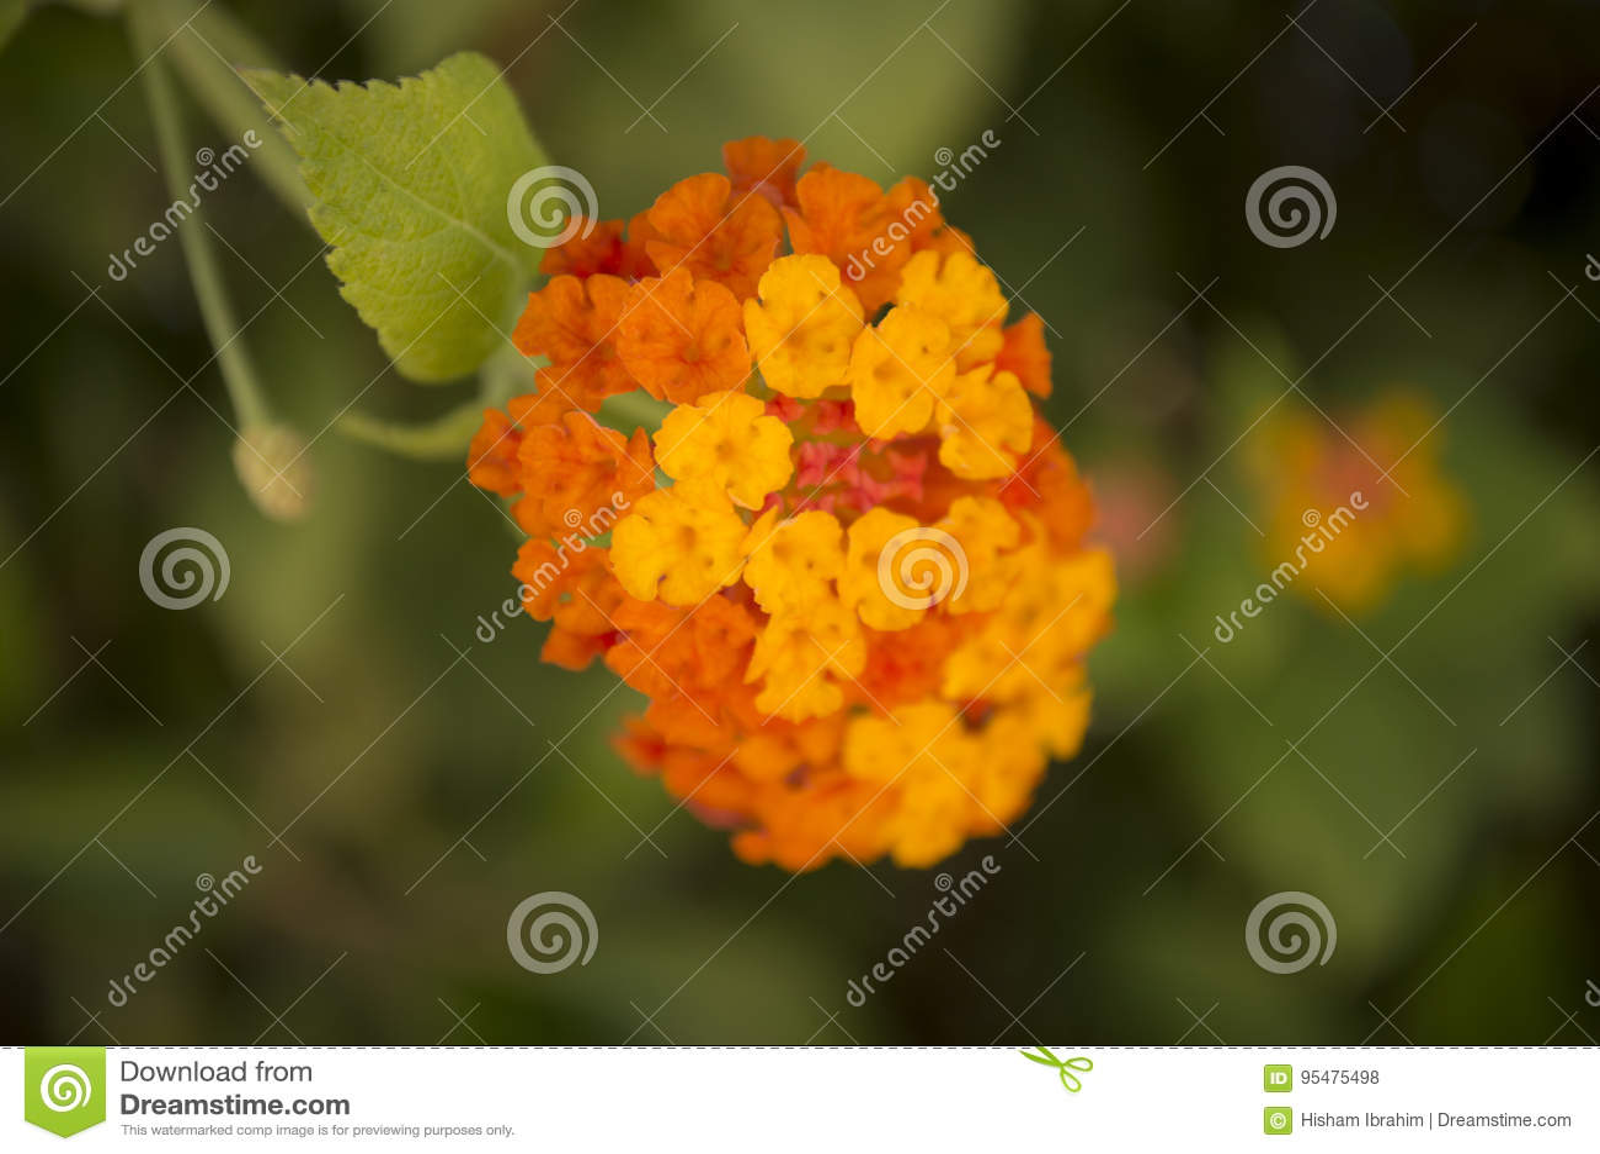 Cool barwionych kwiaty